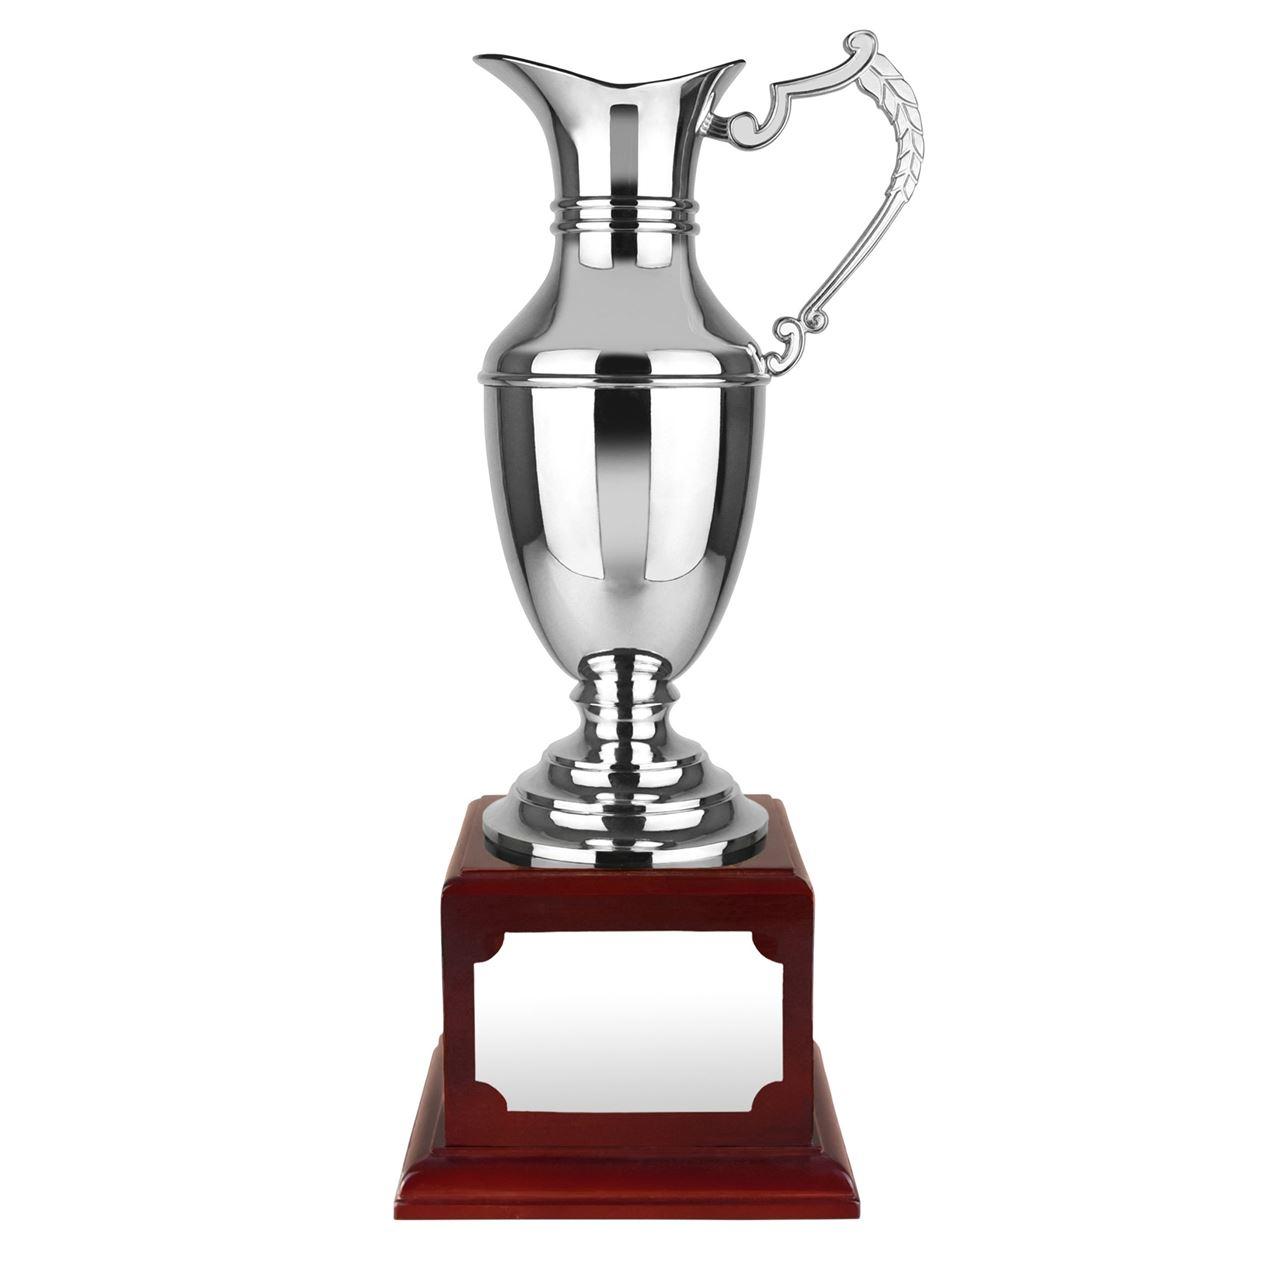 Nickel Plated Endurance Claret Jug Rosewood Plinth - WBC29